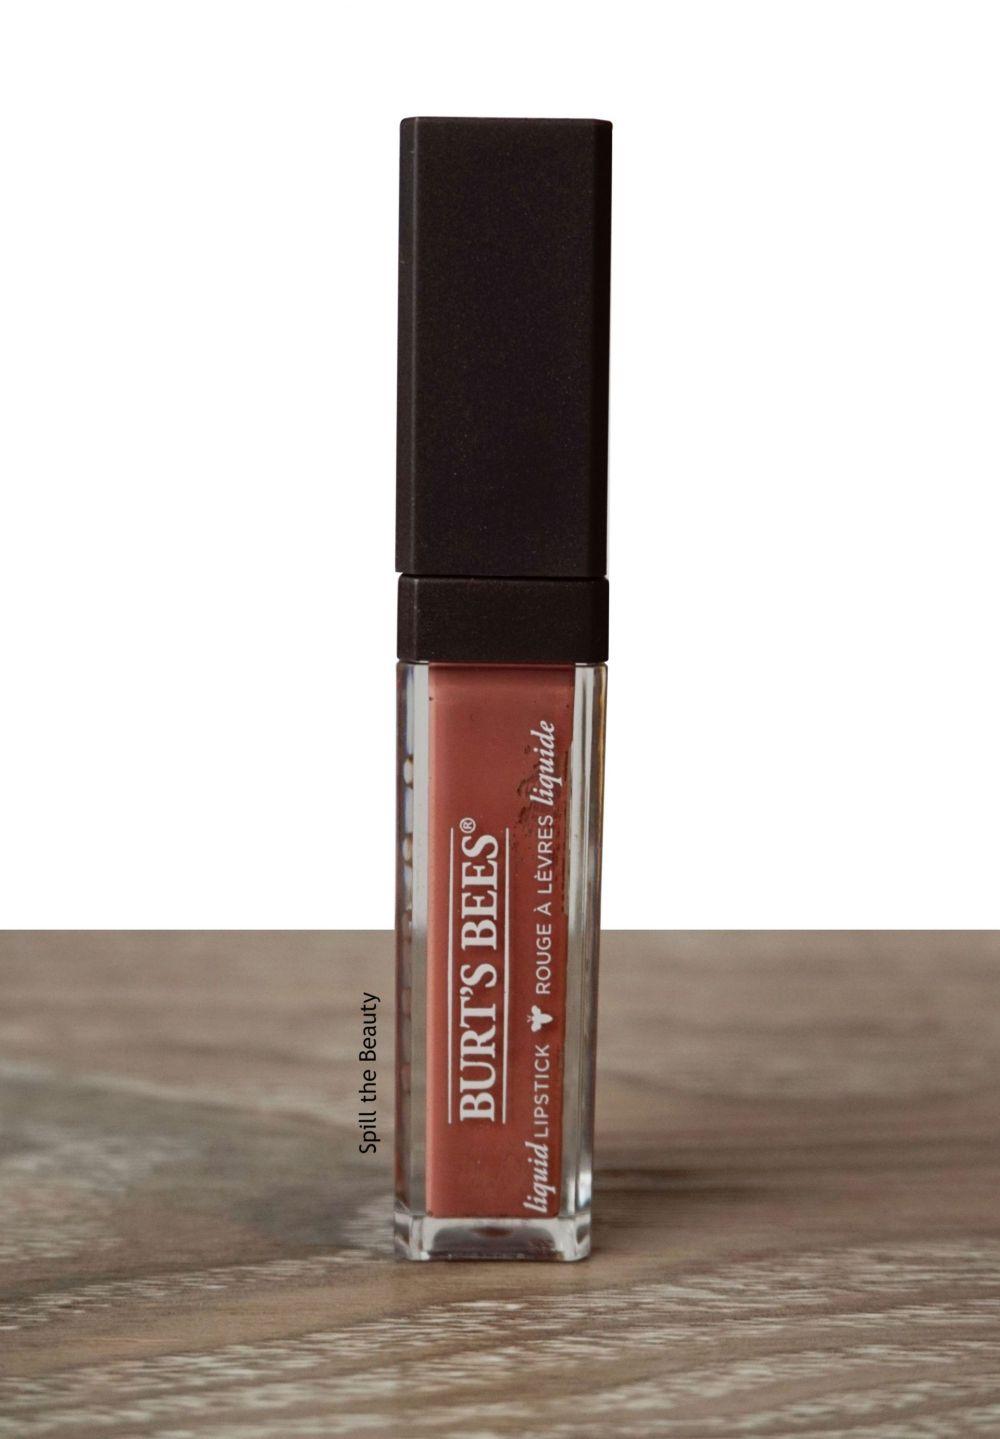 burts bees niagara nude liquid lipstick swatches